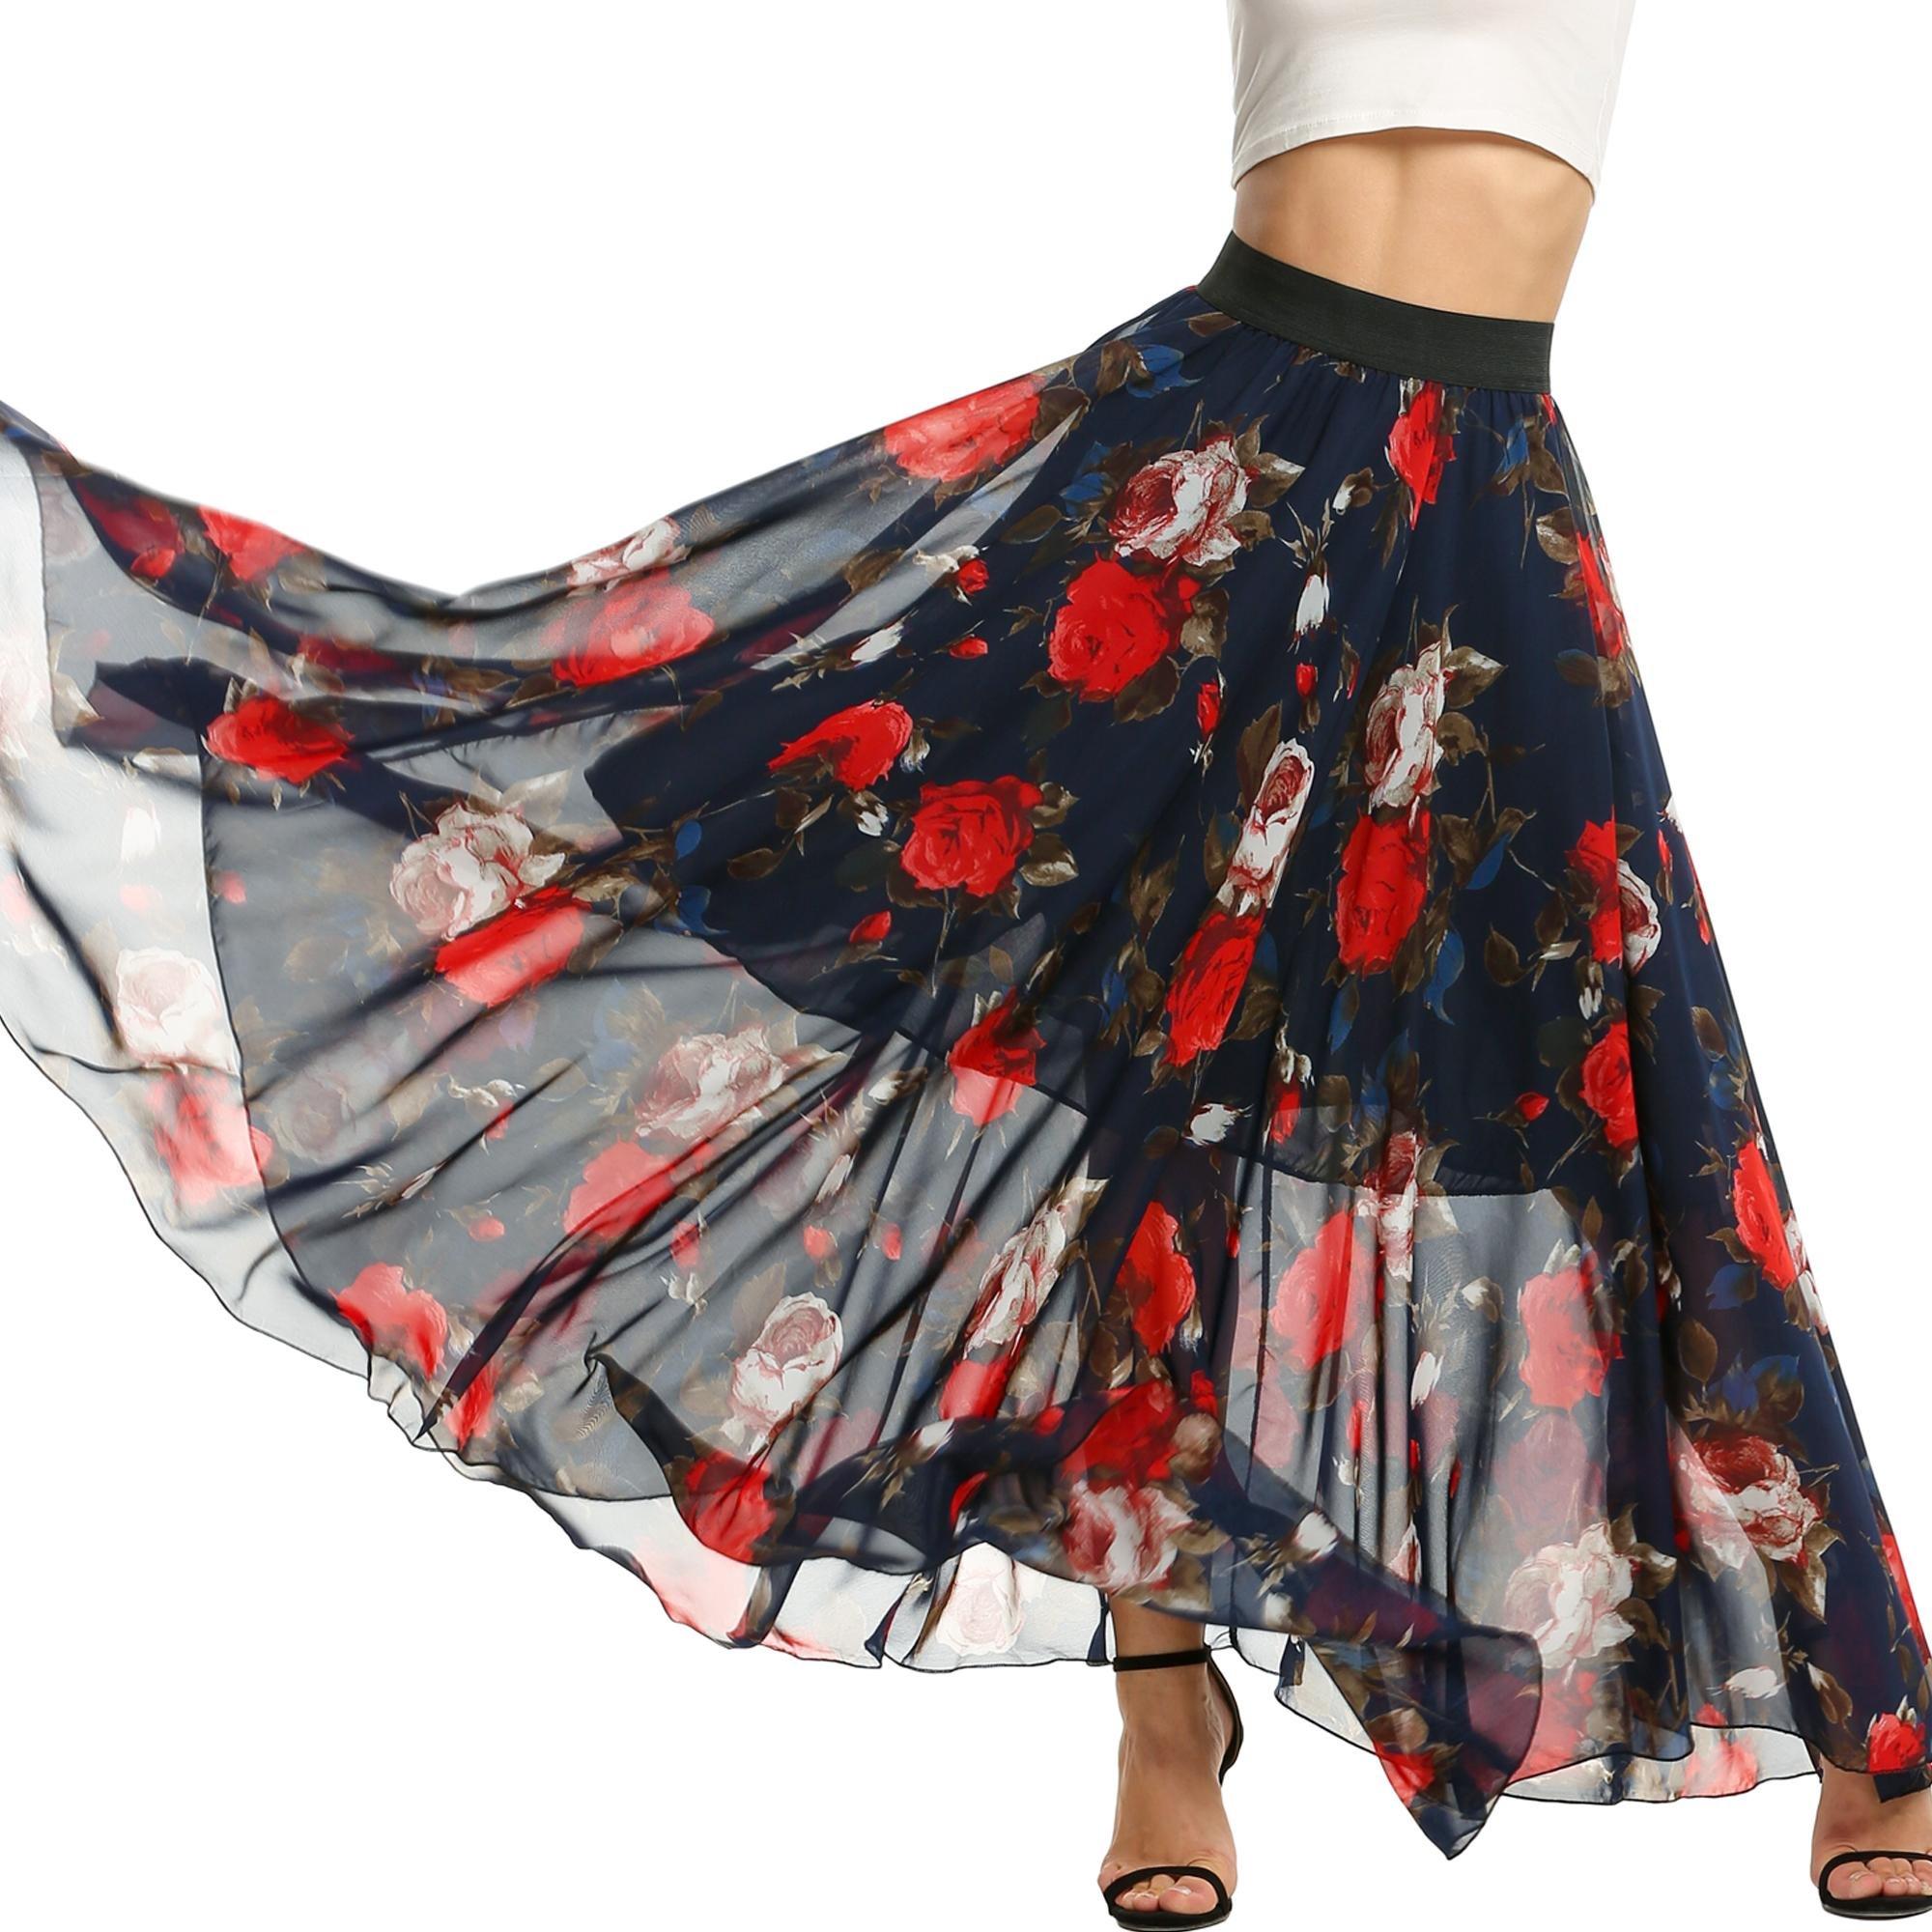 ELESOL Women's Chiffon Big Hem Solid Beach Skirt Vacation Full Length Skirt Floral 3/L